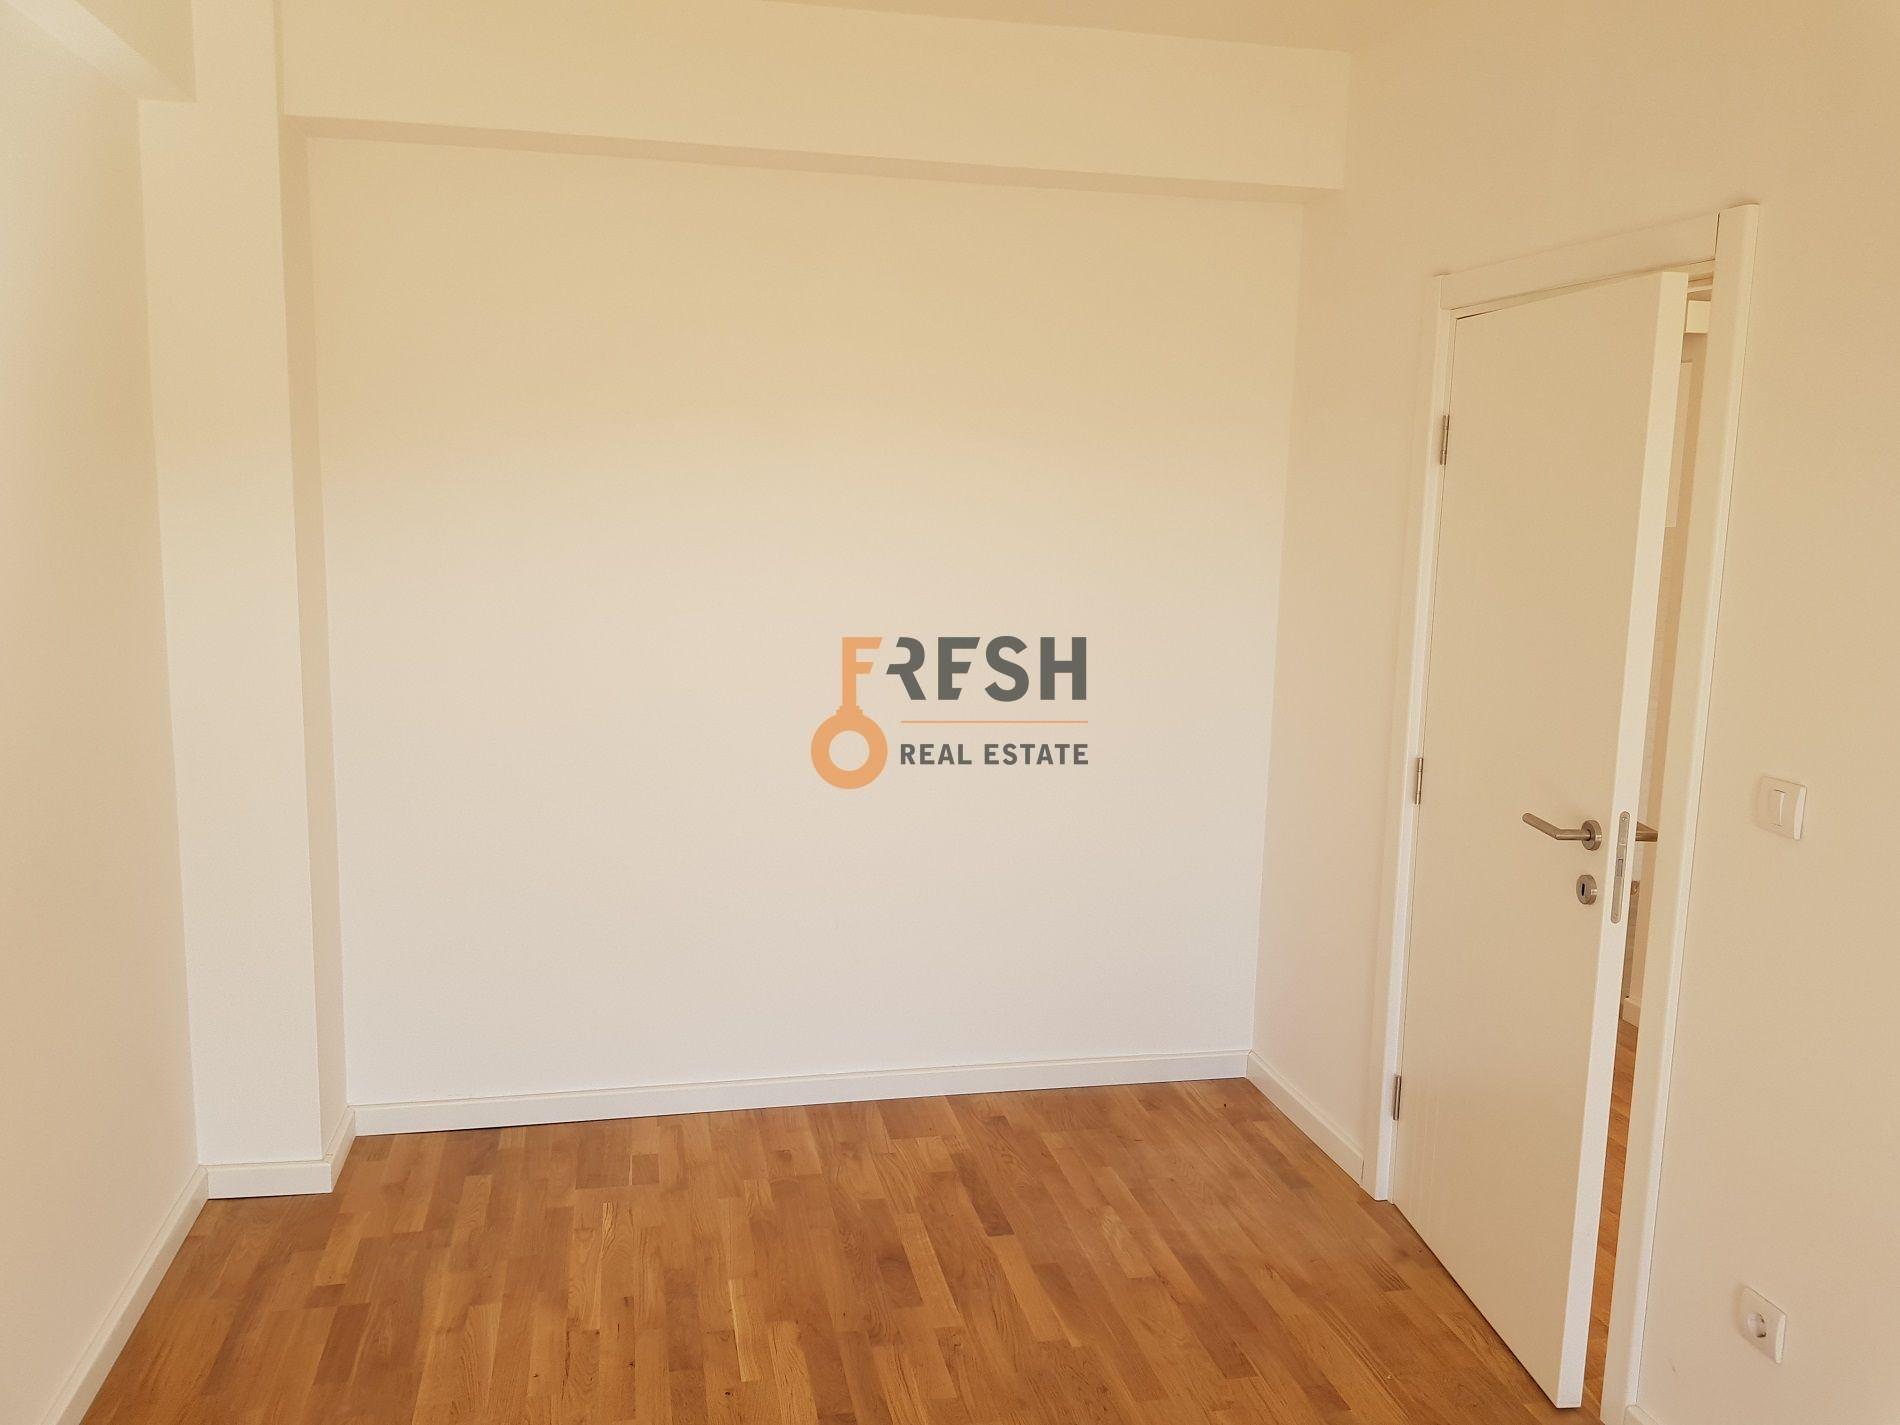 Jednosoban stan 45 m2, Centar, Pljevlja, Prodaja - 11